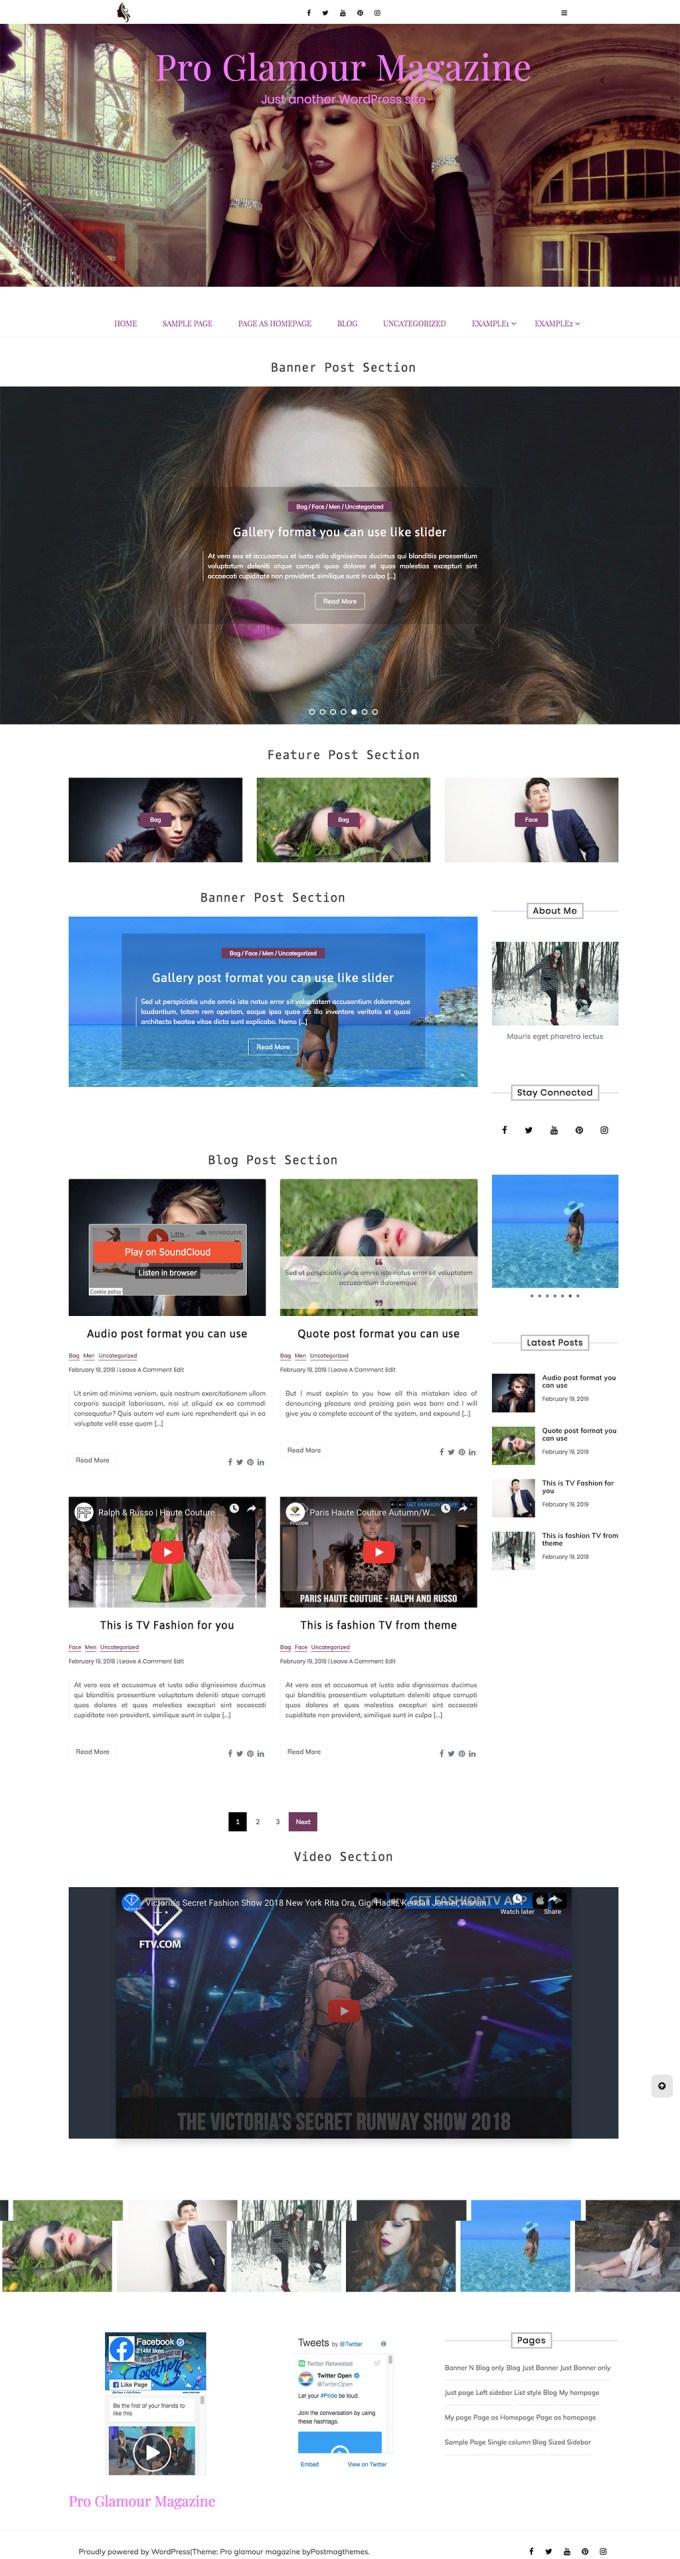 Pro glamour magazine wordpress theme